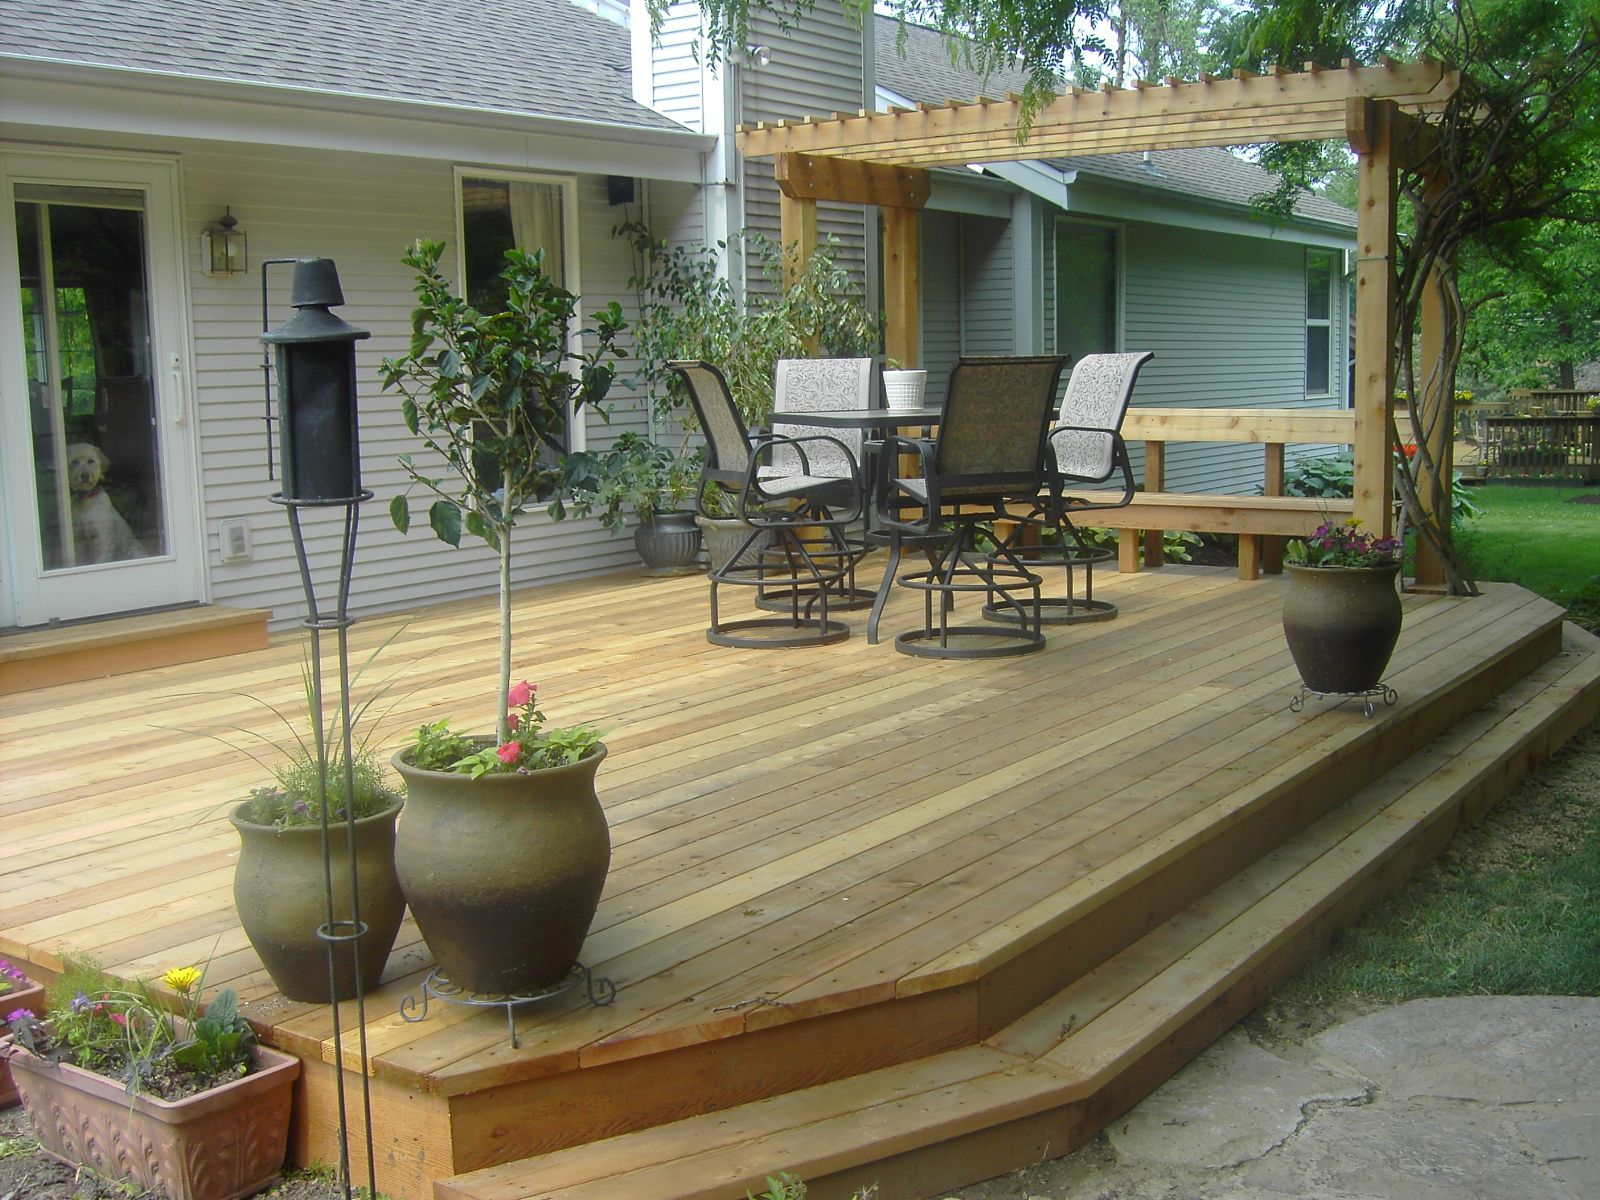 Gardening A Fun And Creative Backyard Project Deck Designs